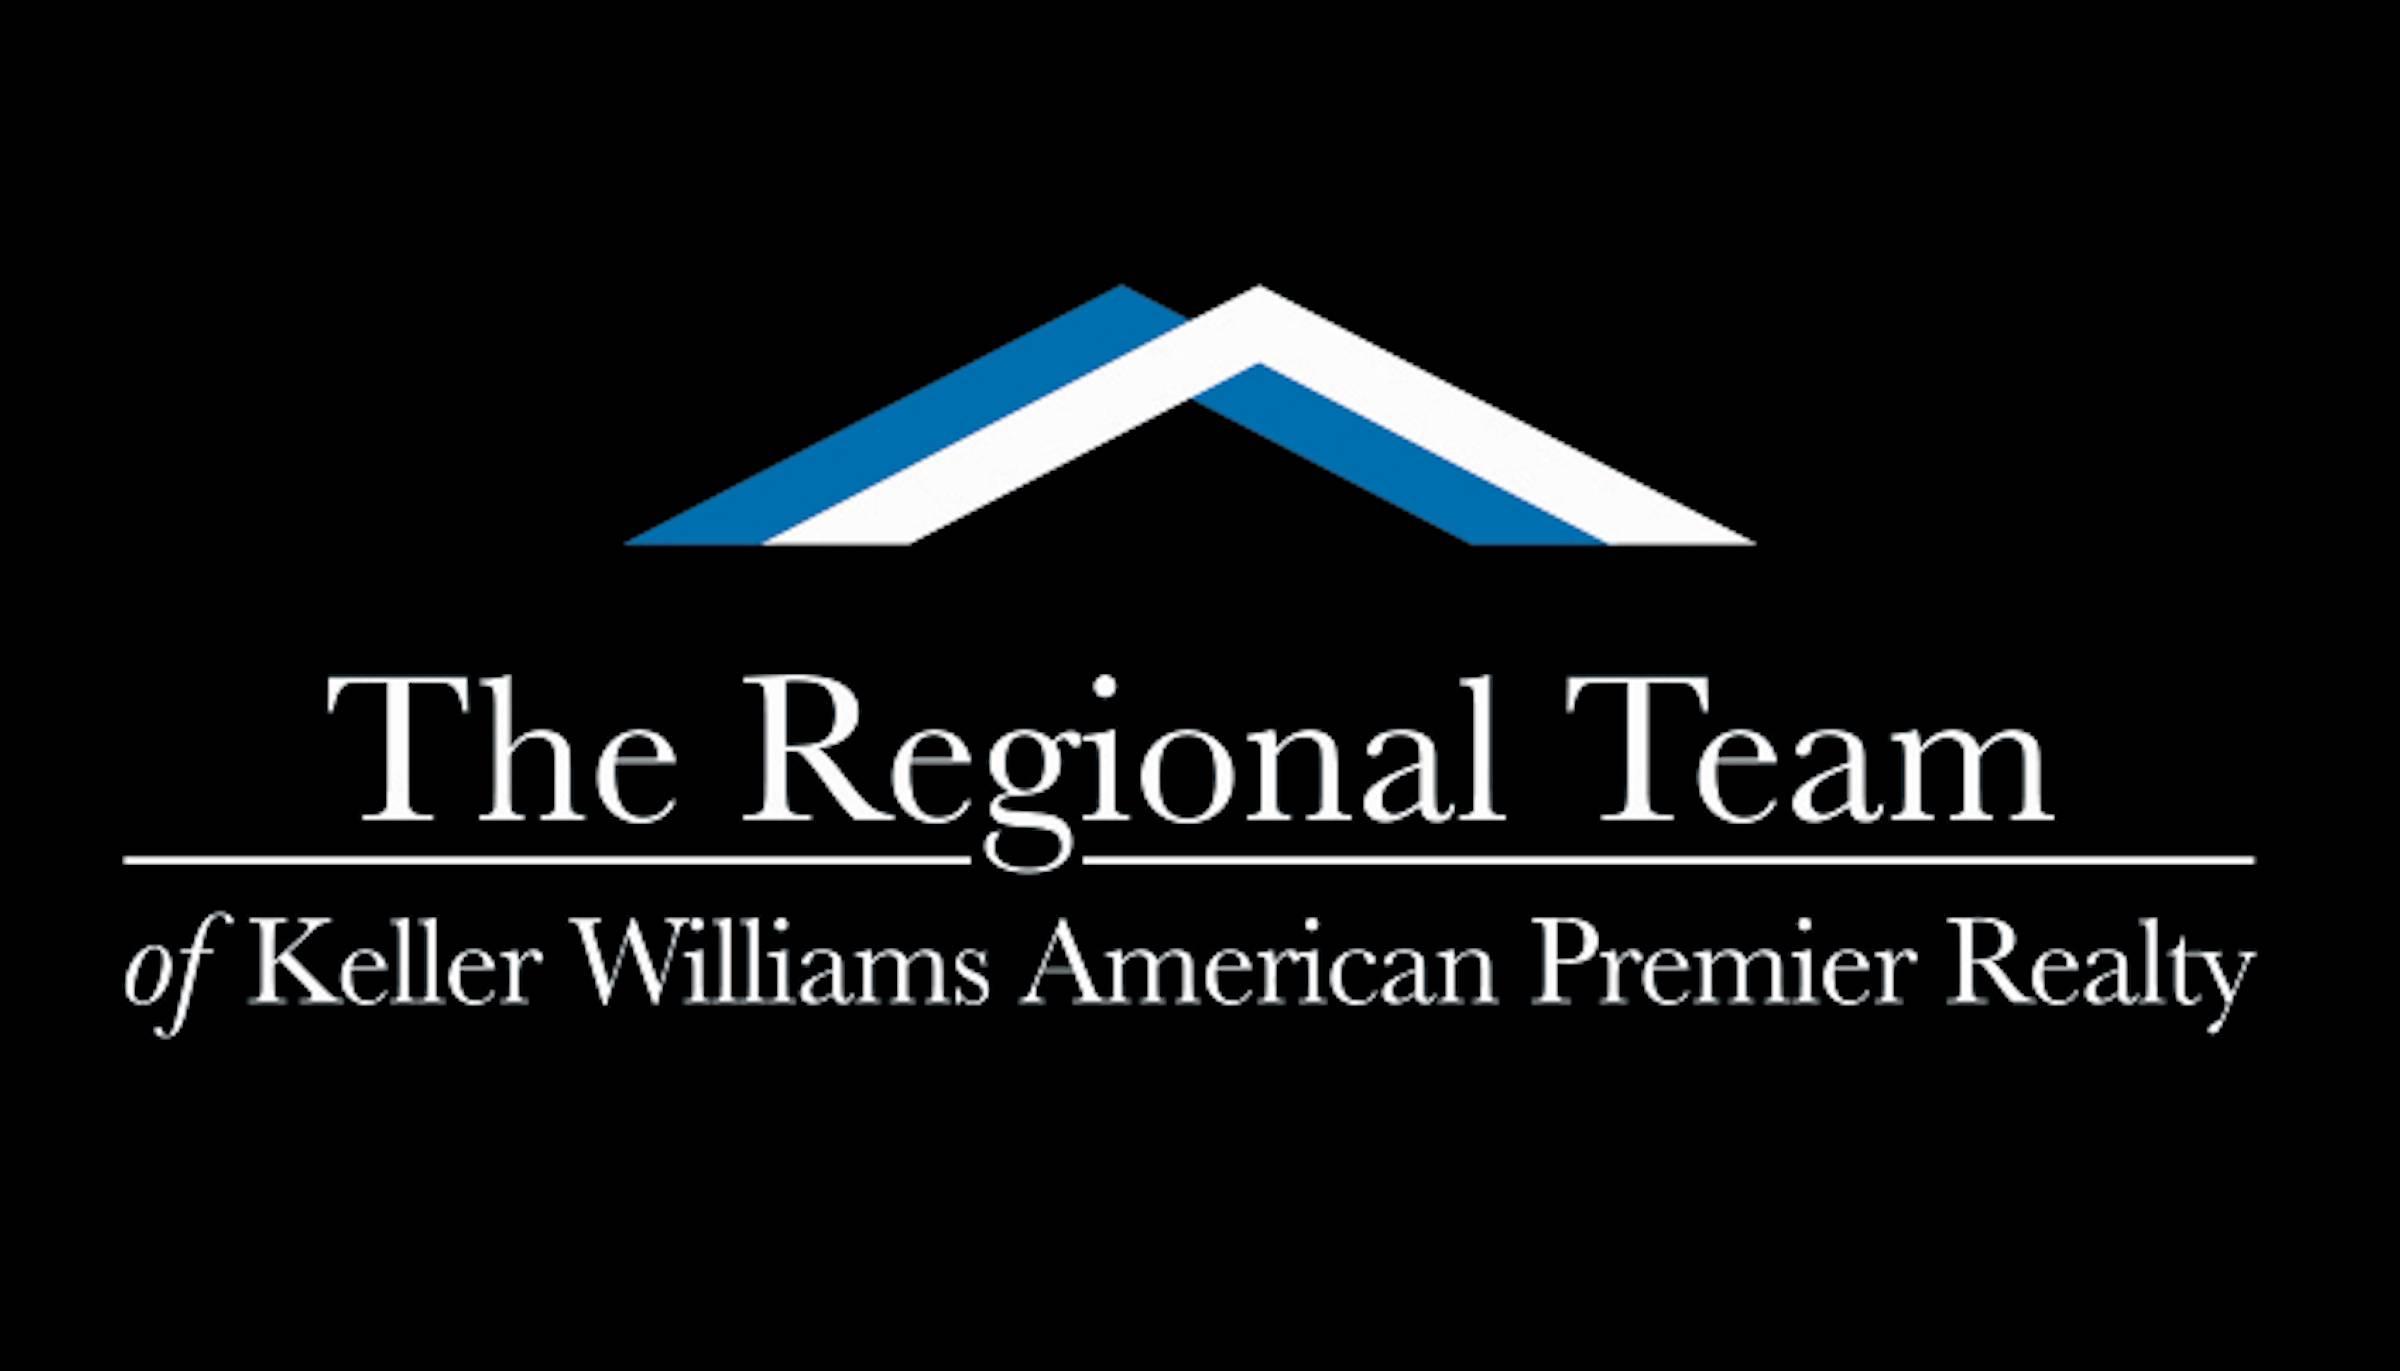 The Regional Team